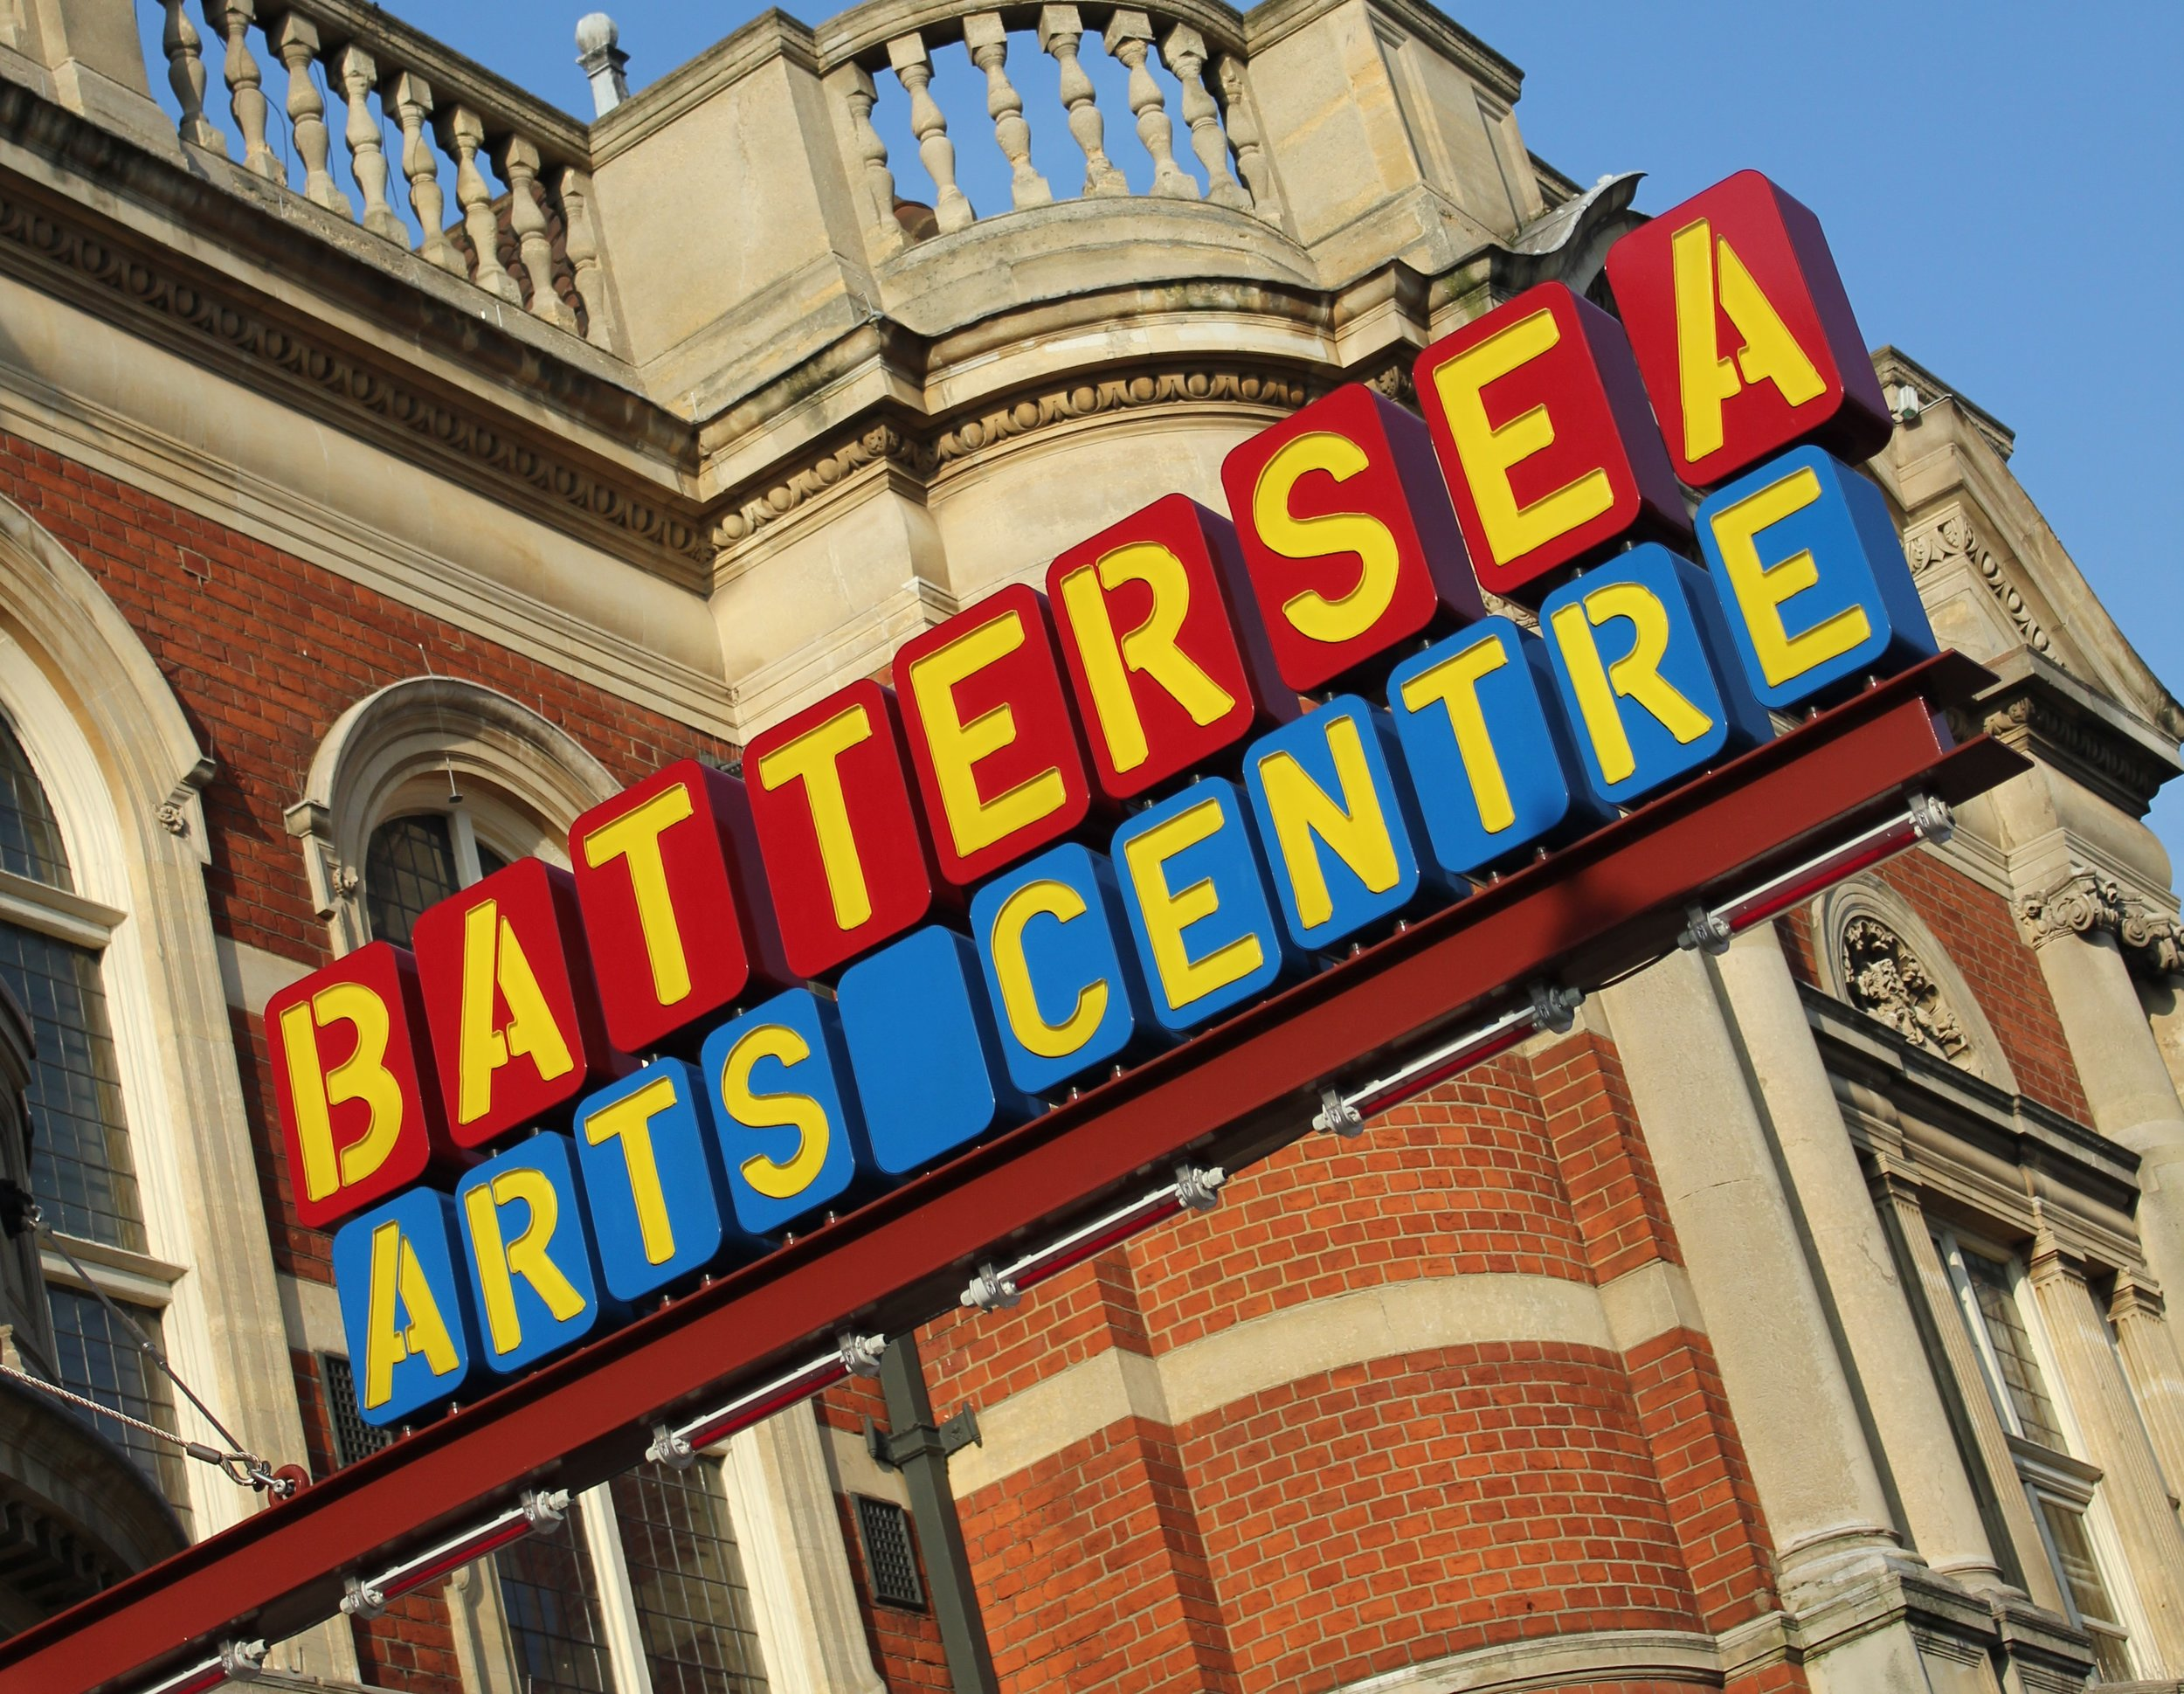 Battersea_Arts_Centre.JPG